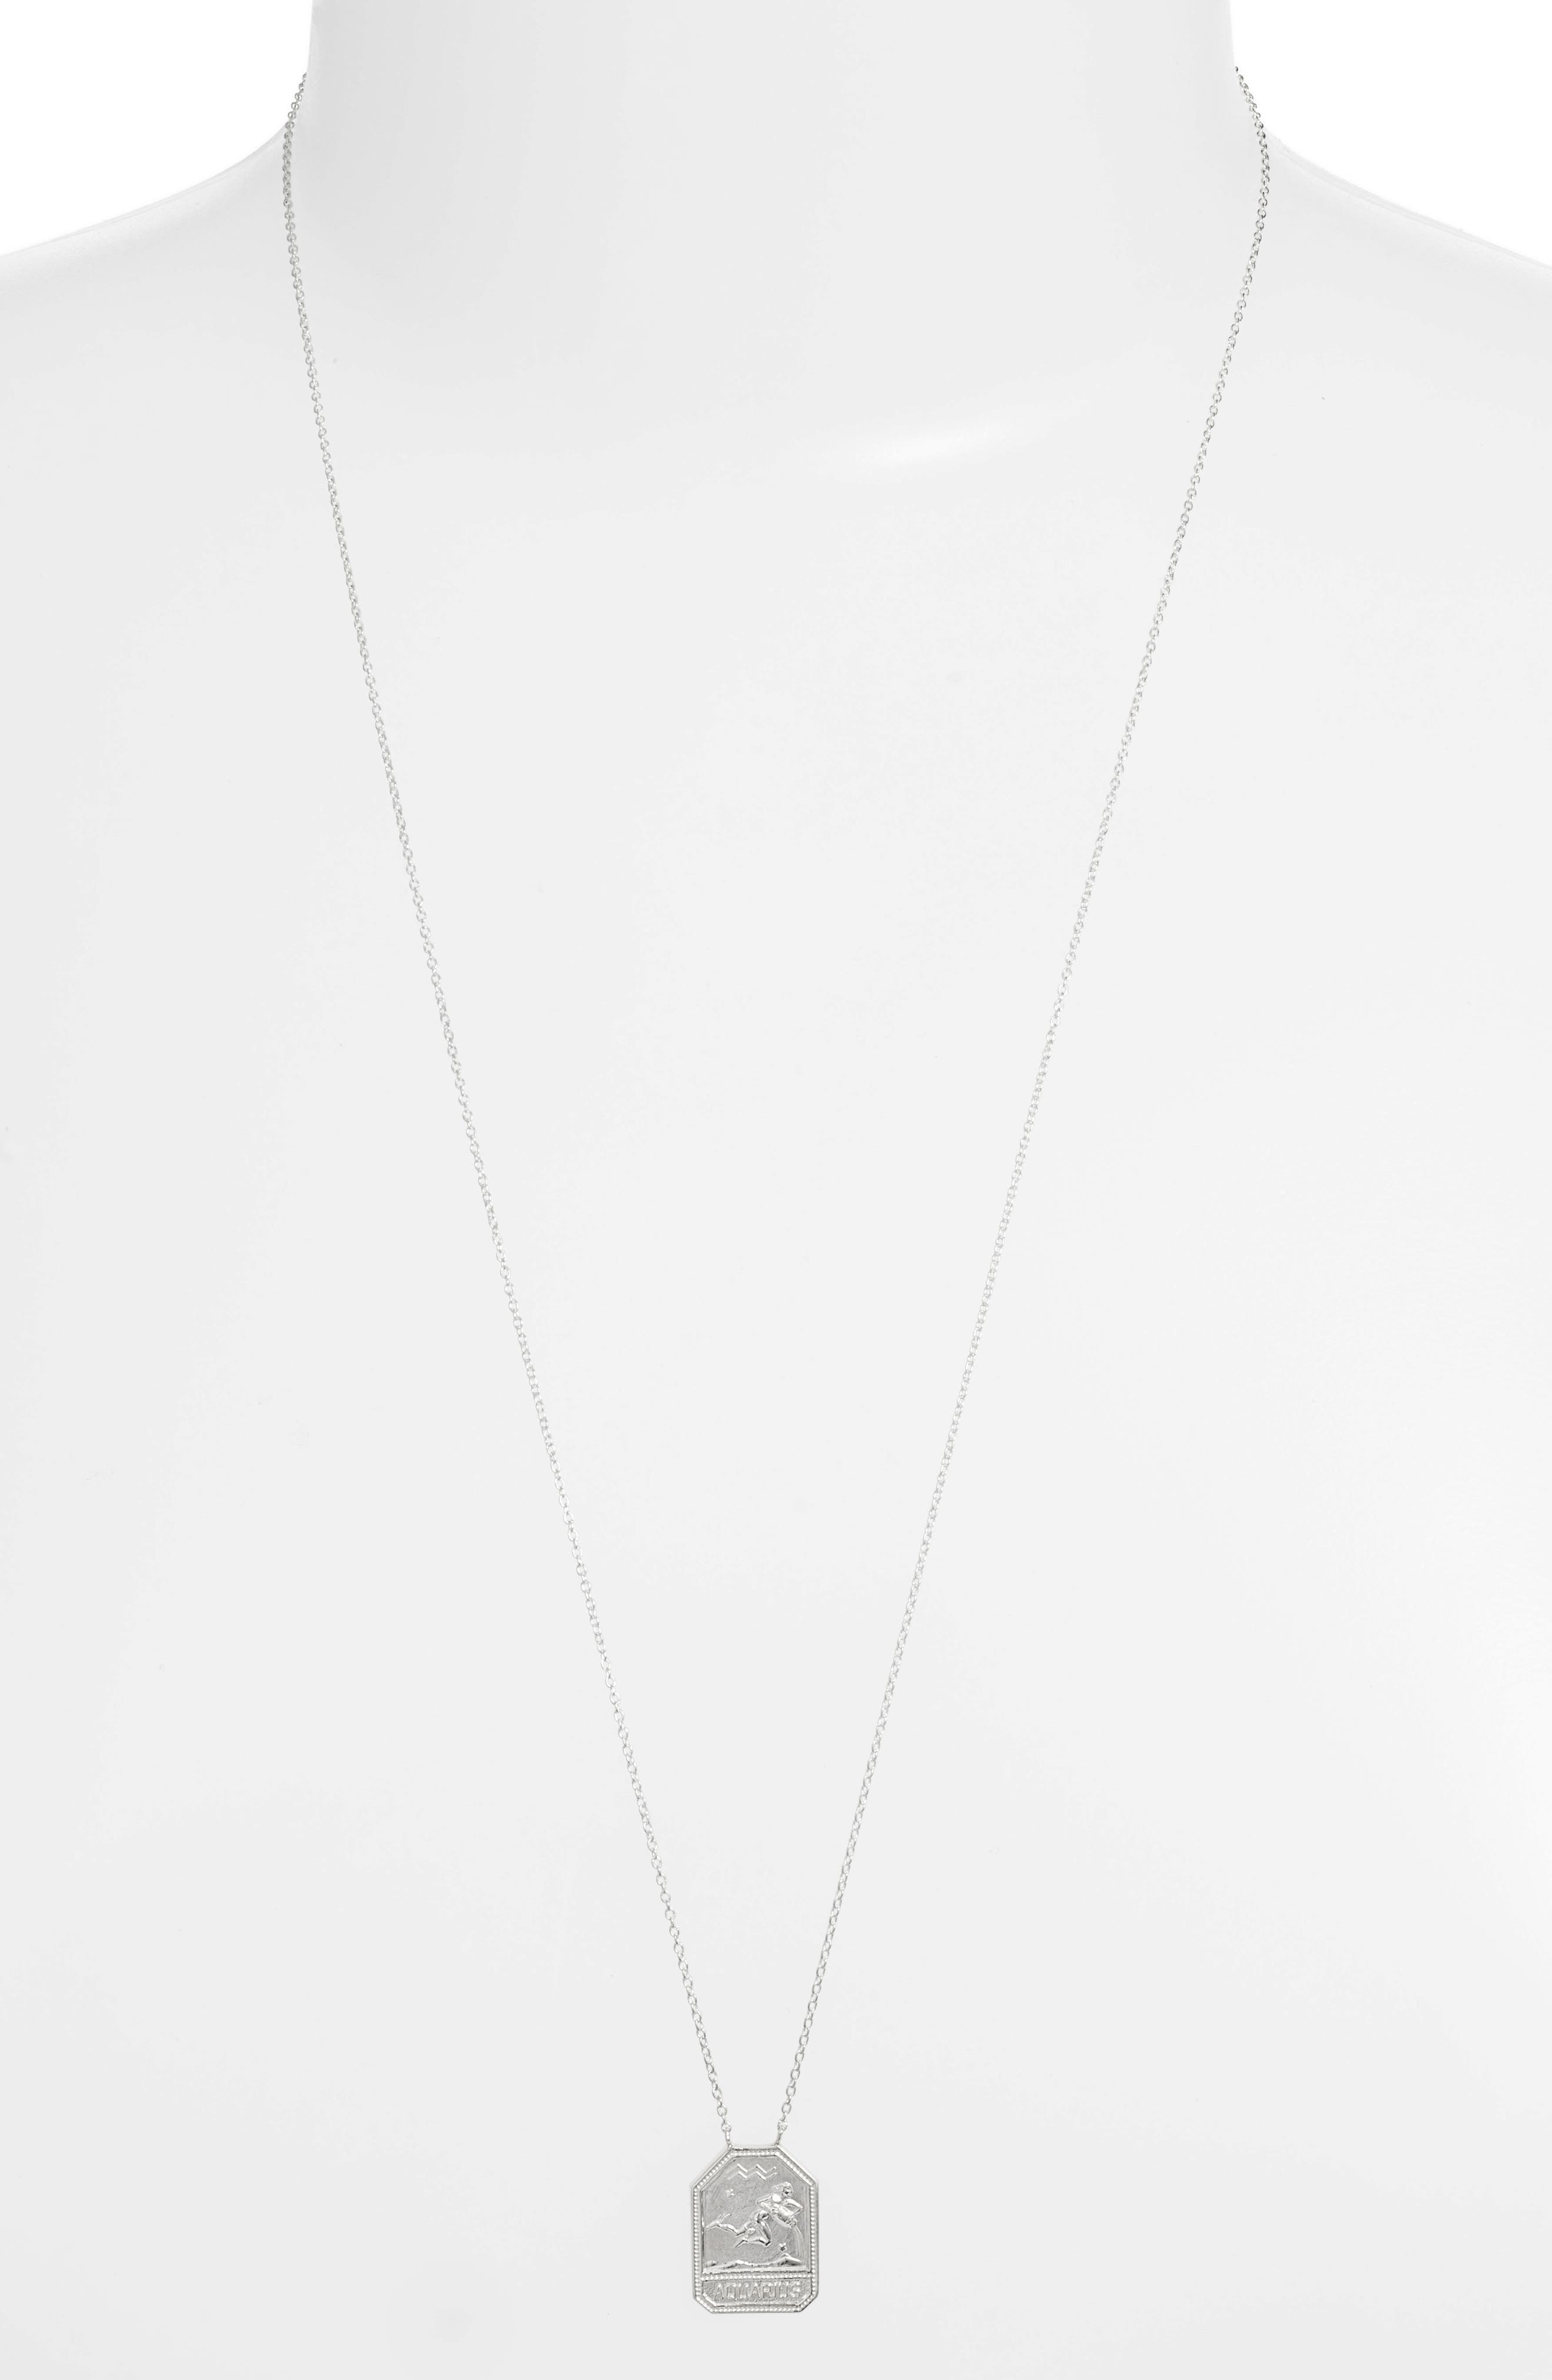 Jewelry Kiana Zodiac Pendant Necklace,                             Main thumbnail 1, color,                             AQUARIUS-SILVER